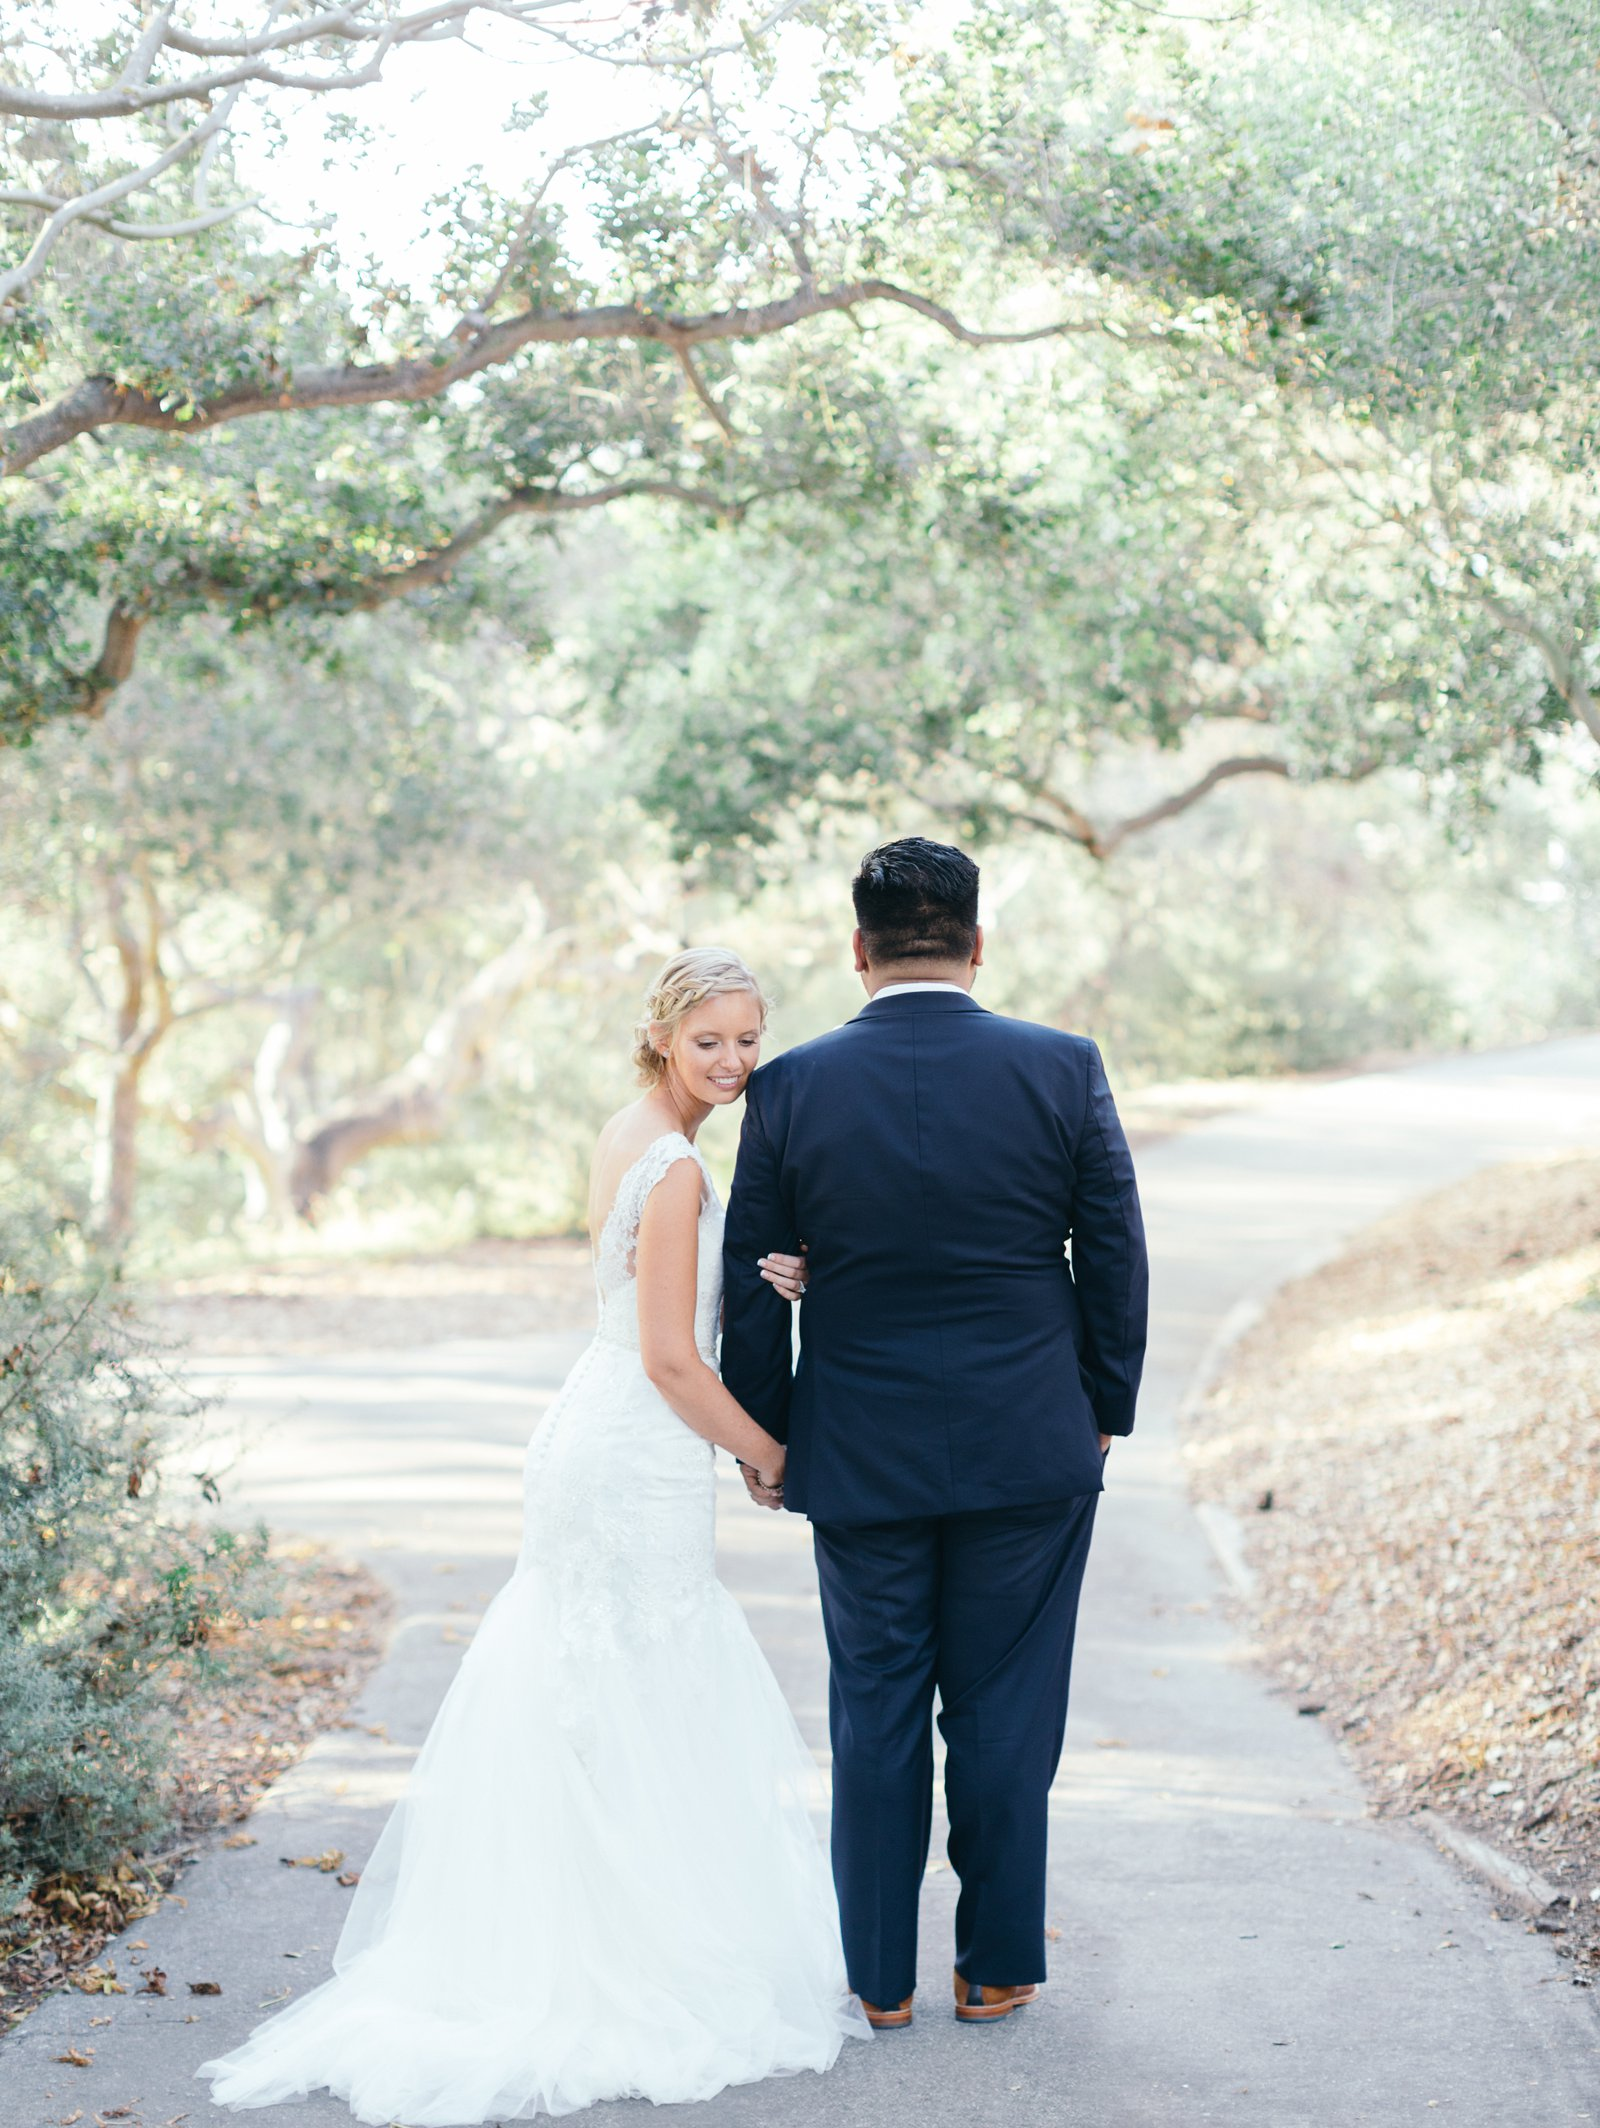 Newlyweds after their Godric Grove wedding in Santa Barbara.